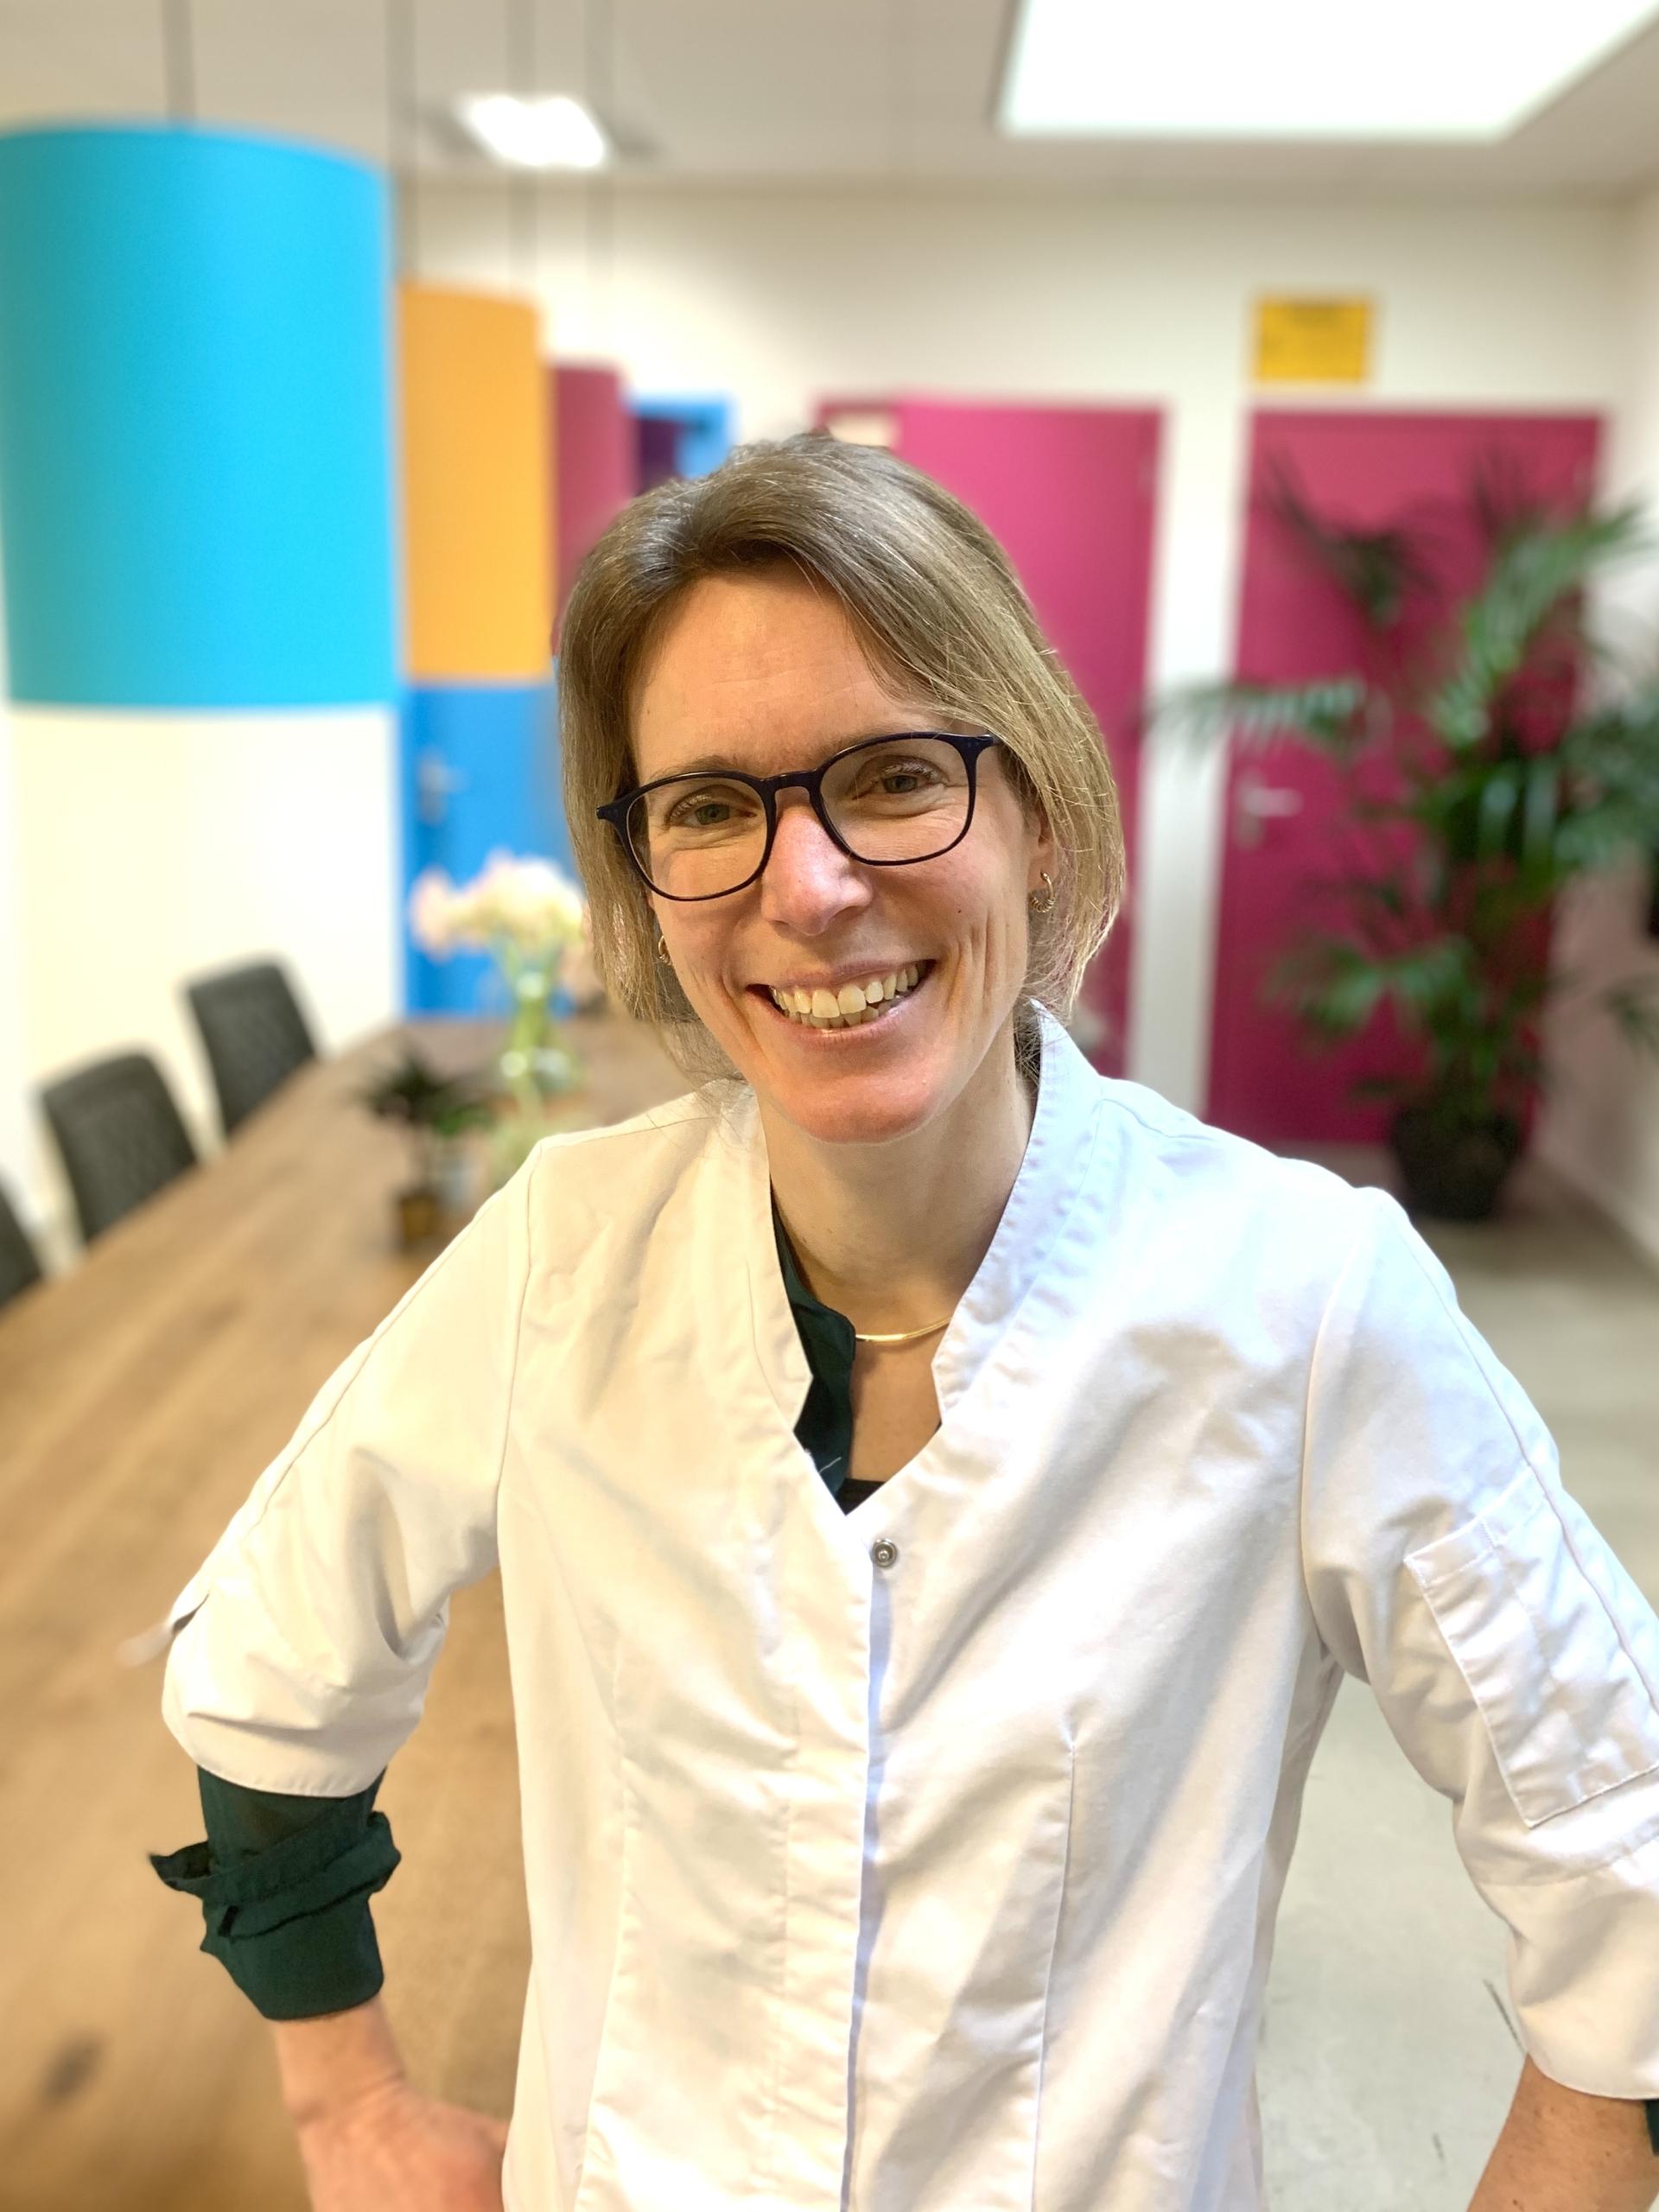 KNO arts Nijmegen